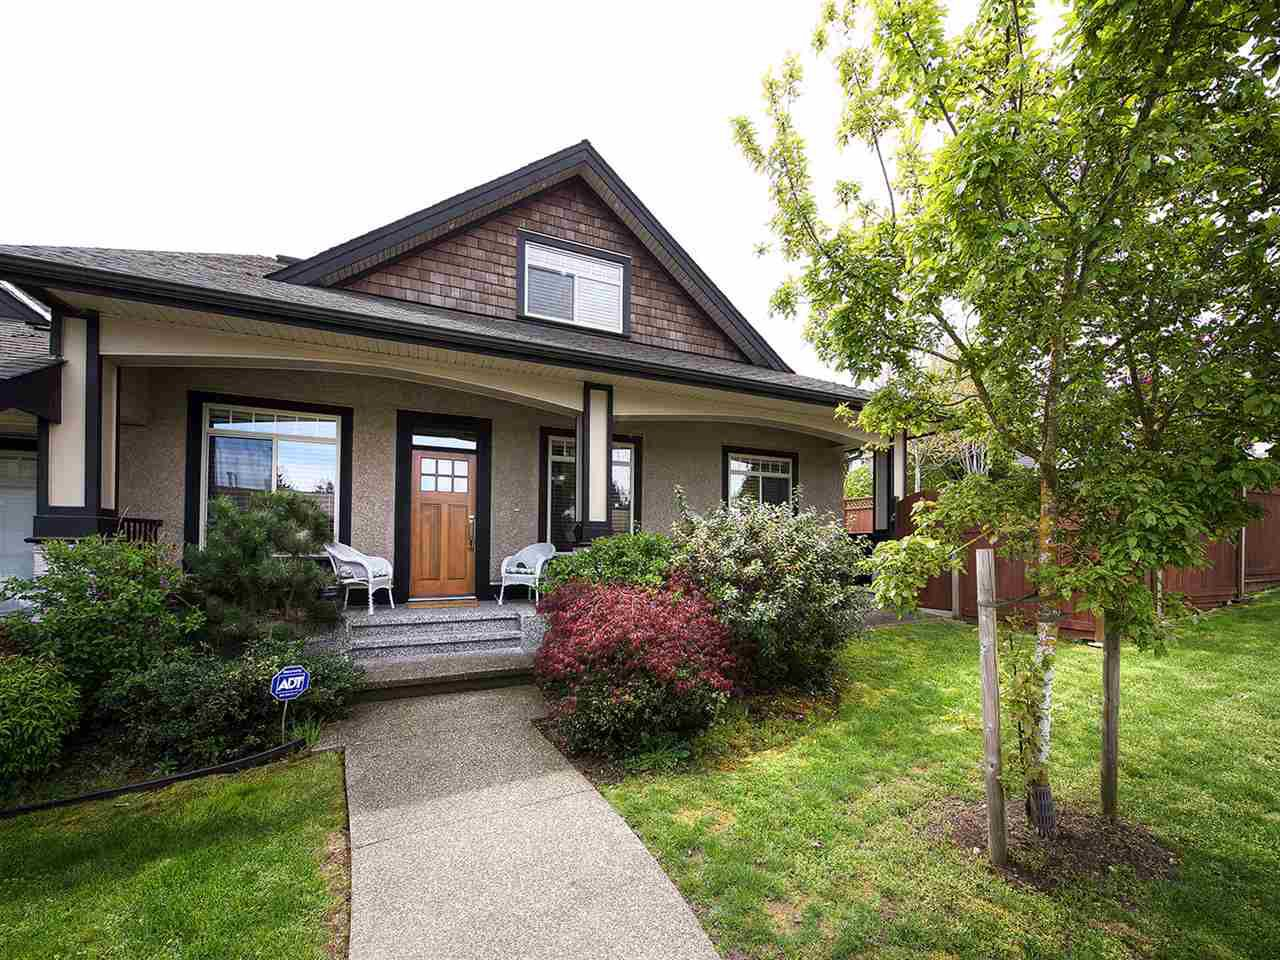 Main Photo: 390 55 Street in Delta: Pebble Hill House 1/2 Duplex for sale (Tsawwassen)  : MLS®# R2162458